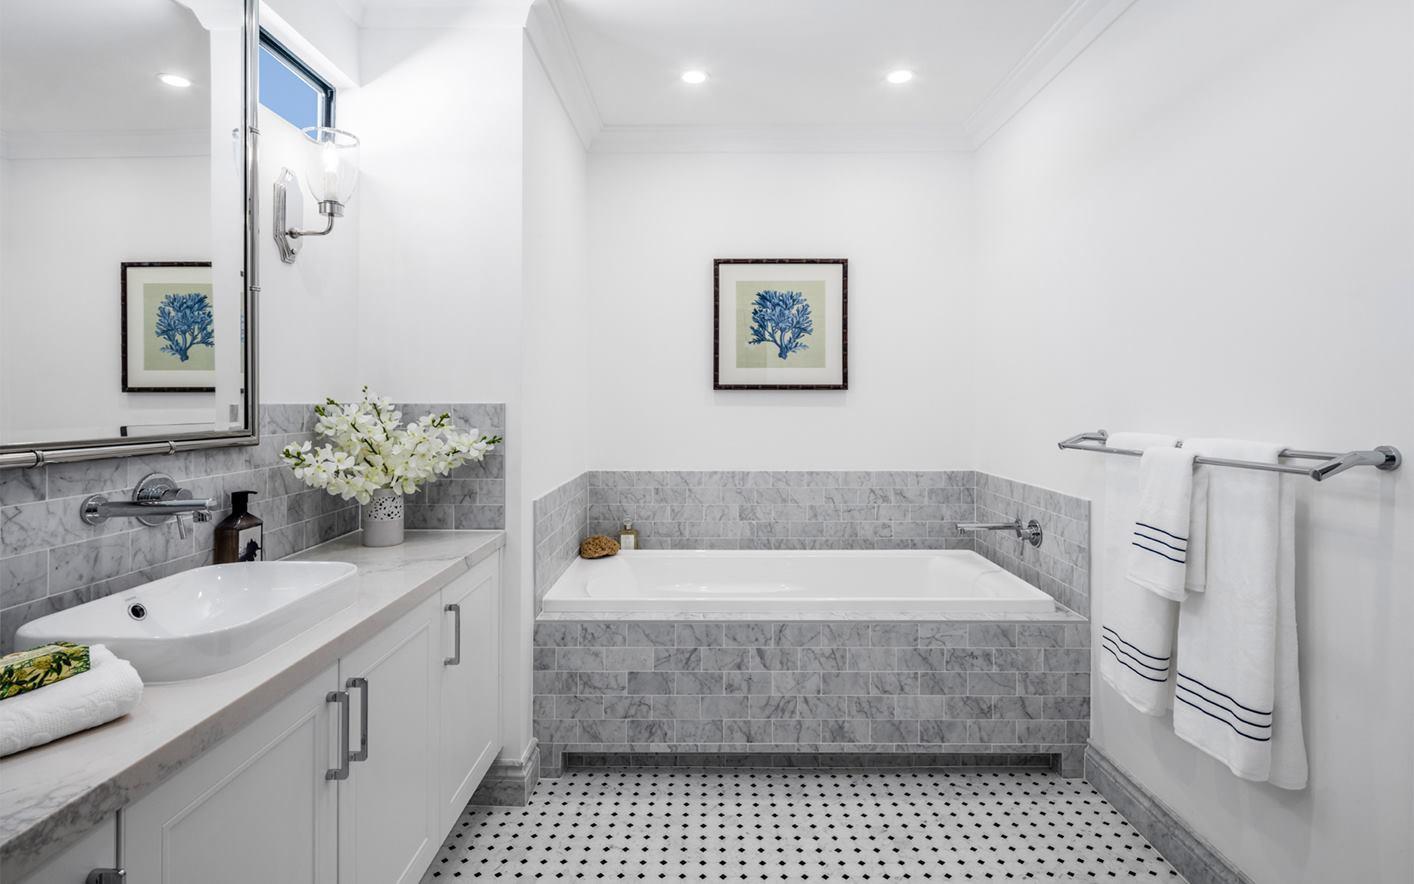 Vanity - C white - B grey - semi recesse